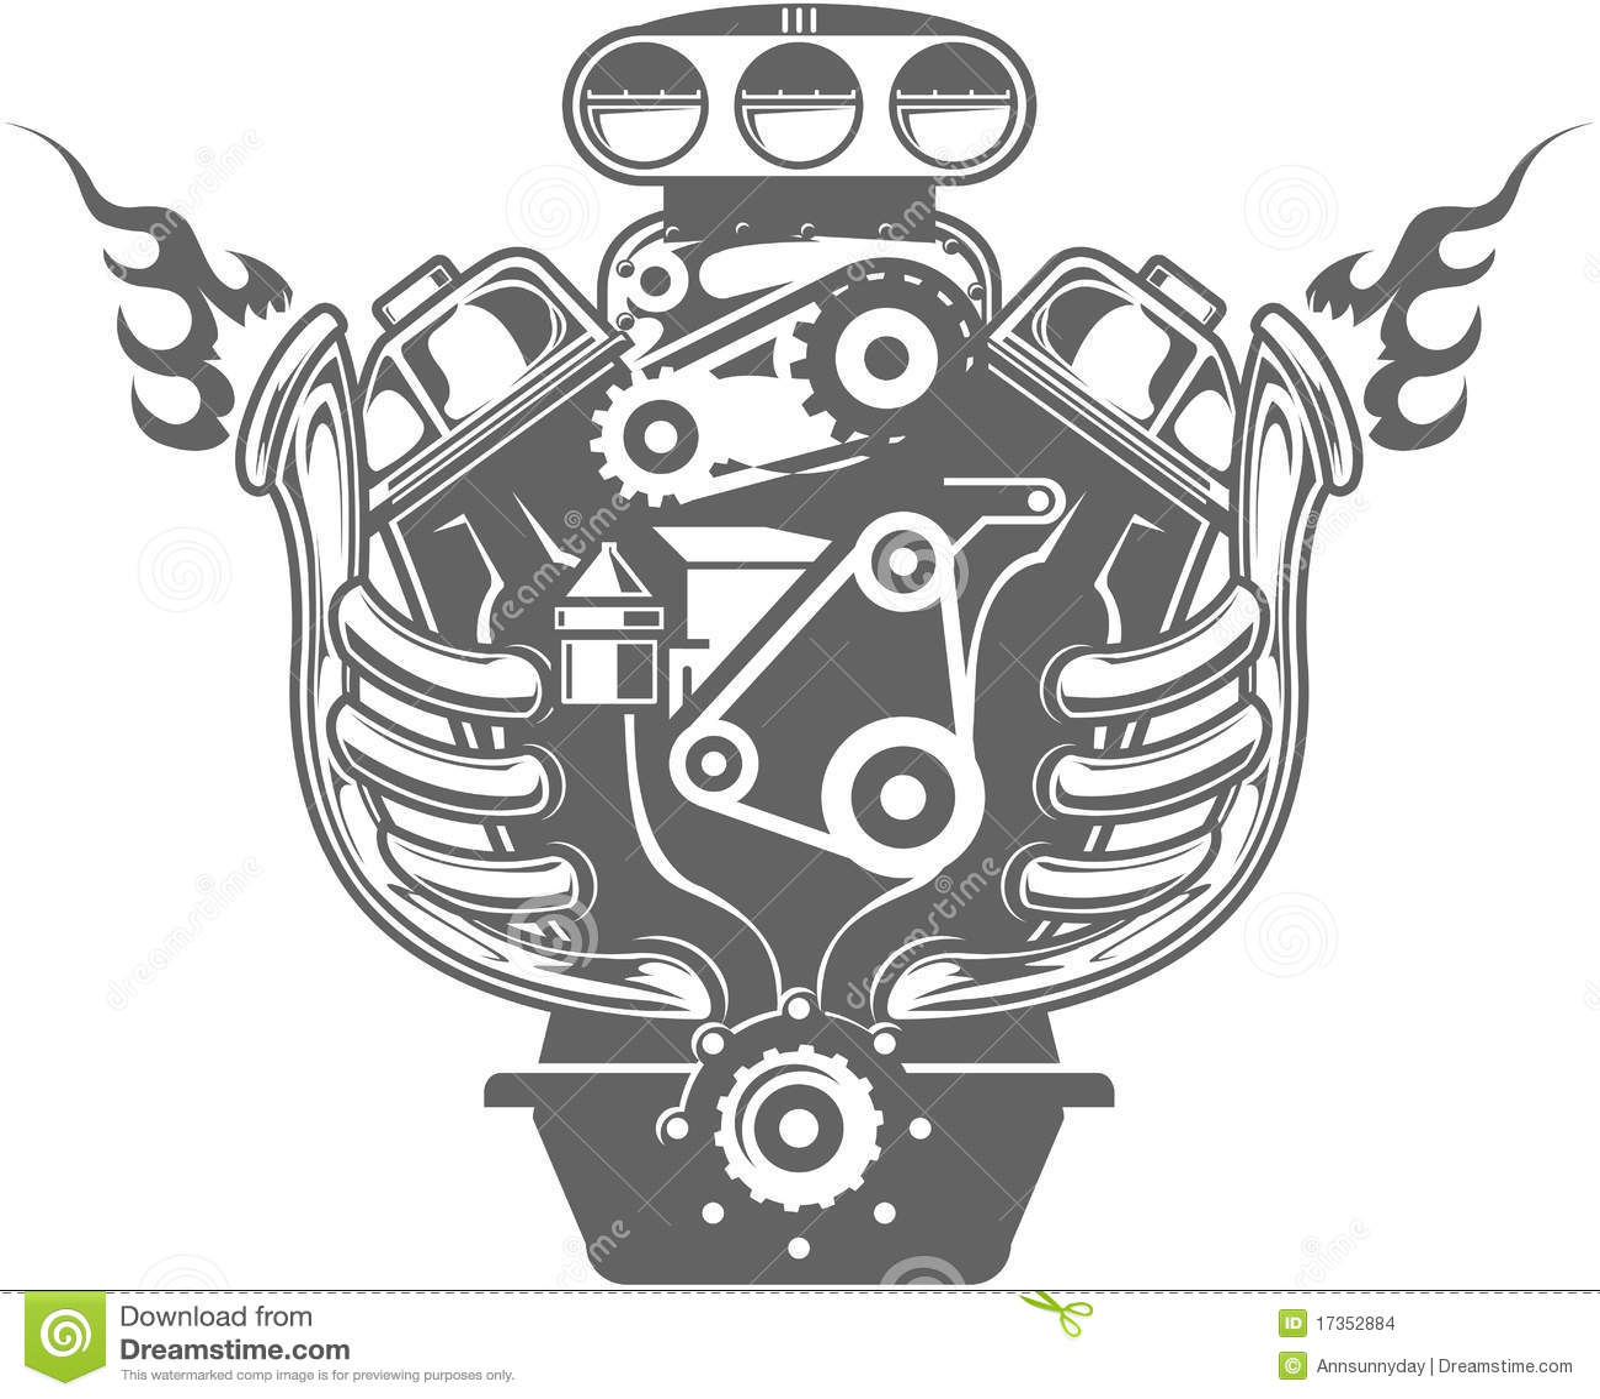 V8 Engine Clipart Racing Engine Stock Im...